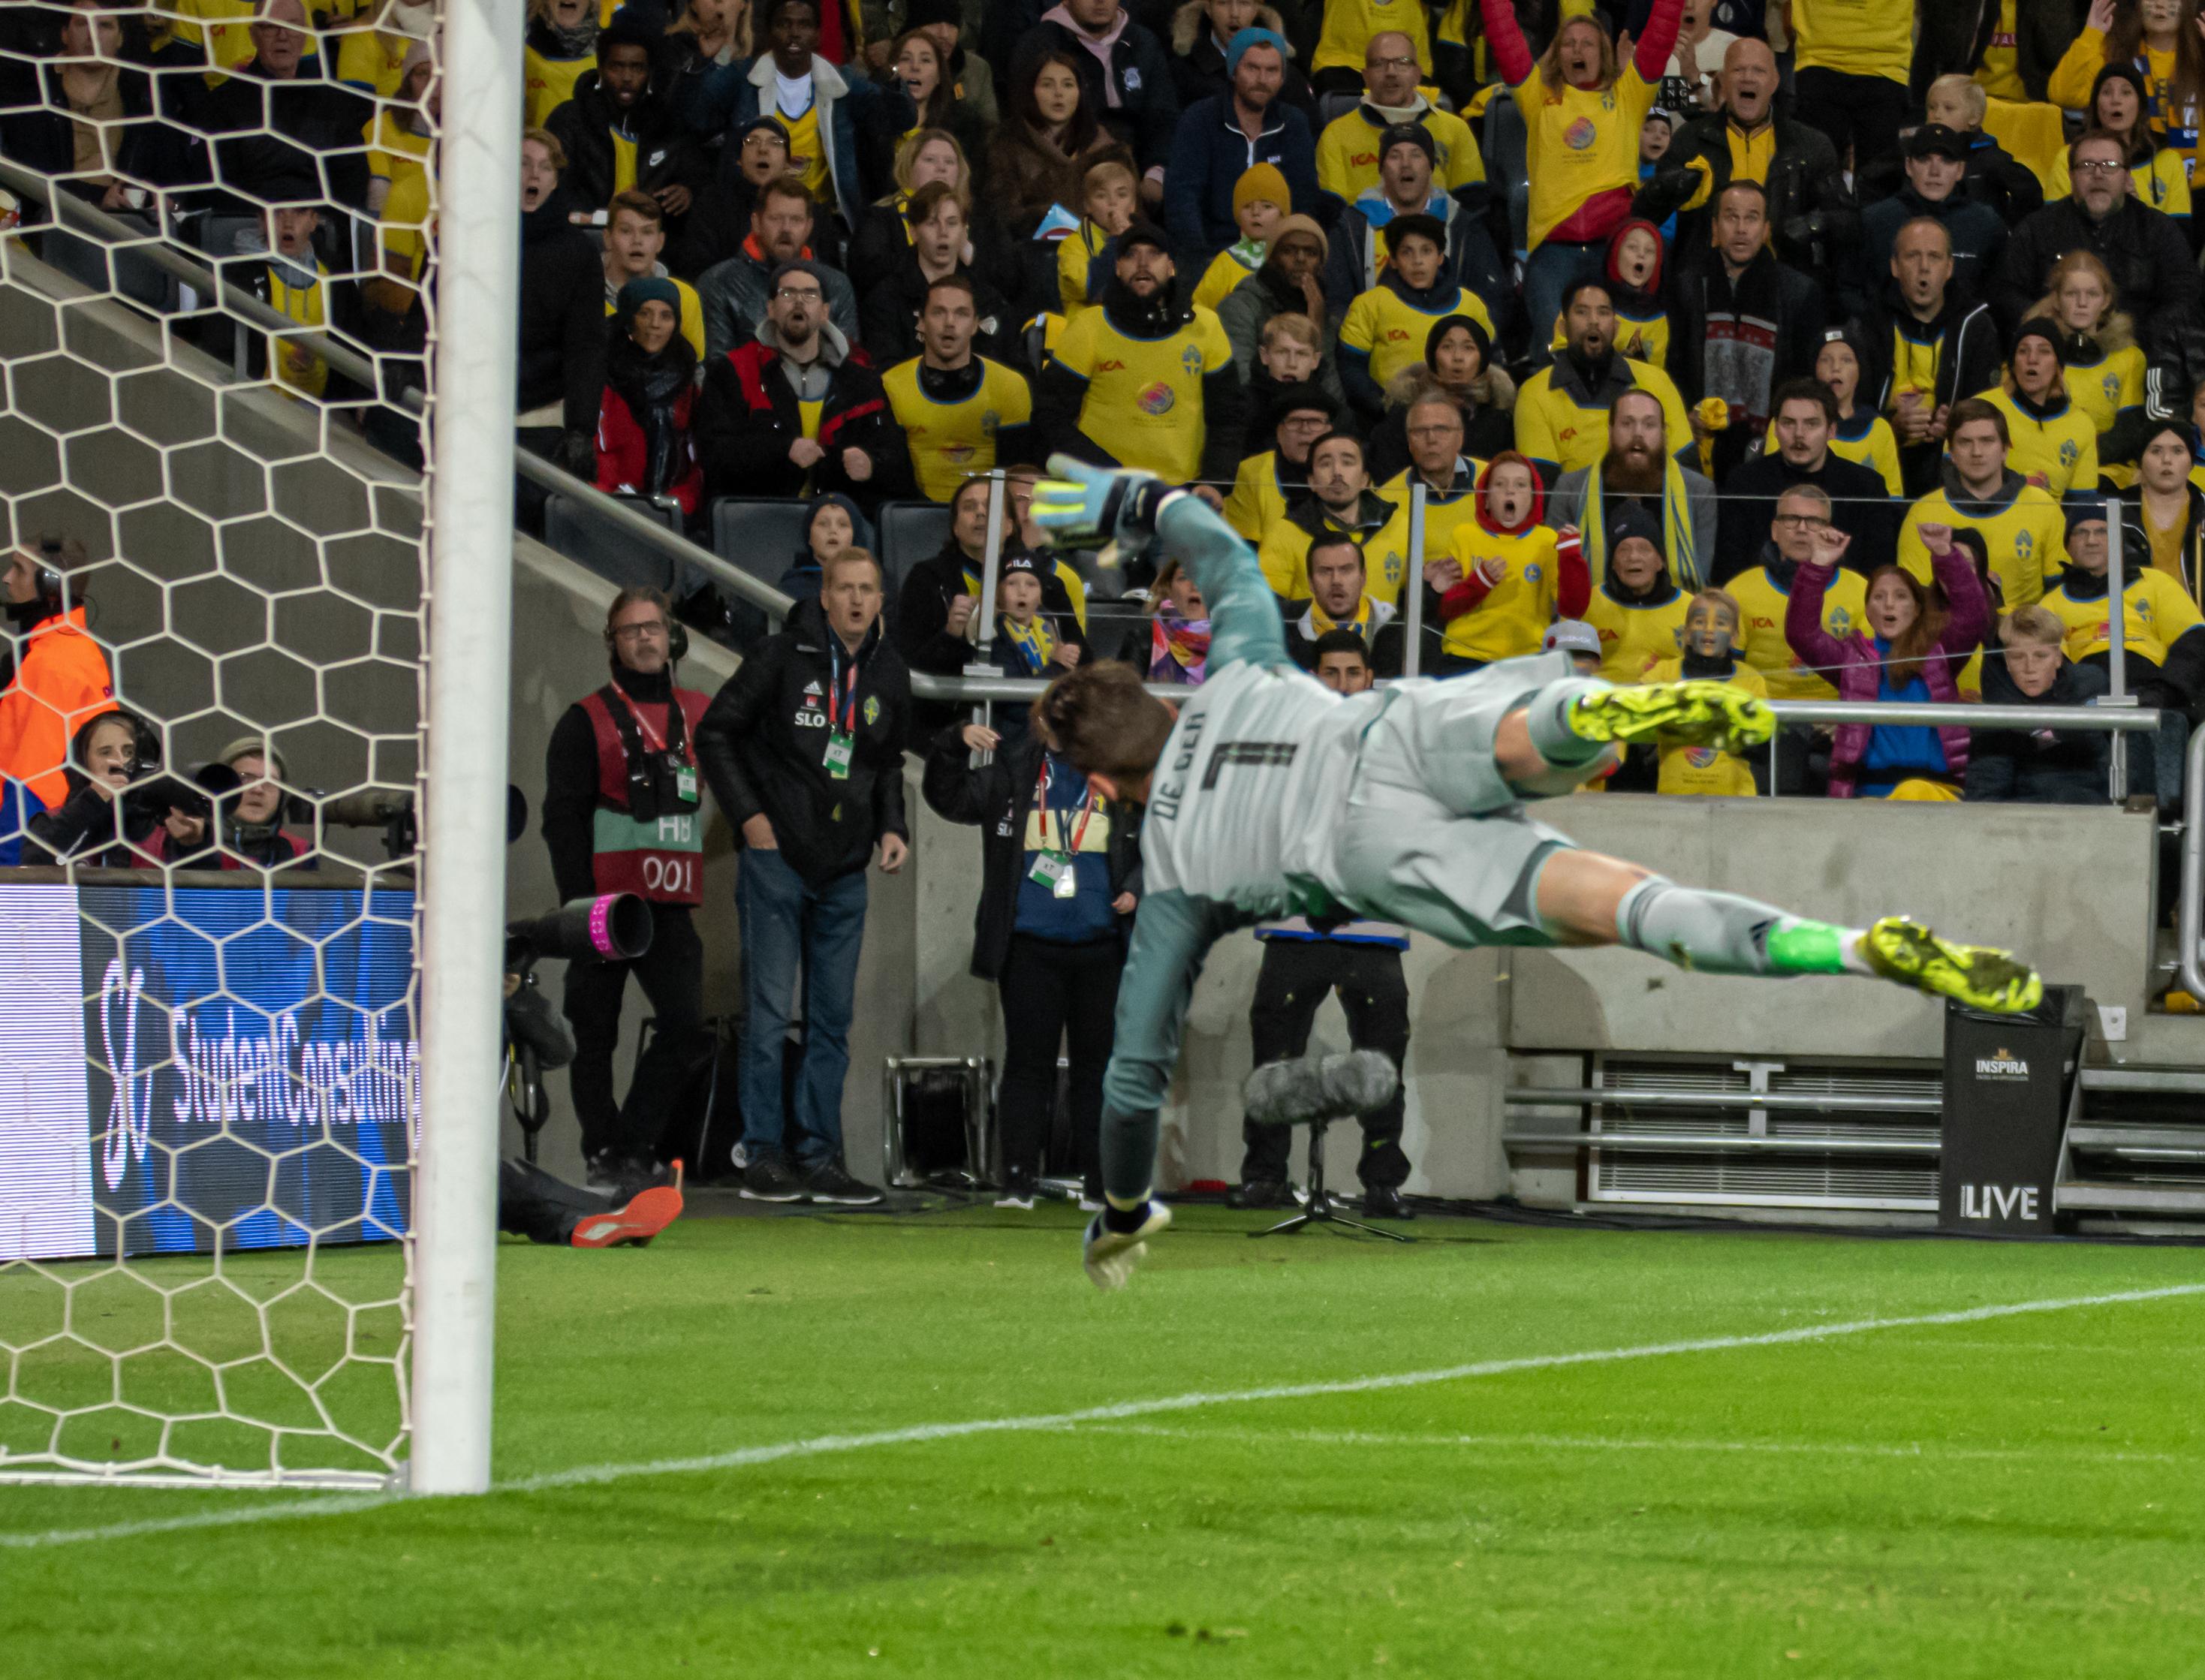 File:UEFA EURO qualifiers Sweden vs Spain 20191015 David de Gea 7.jpg